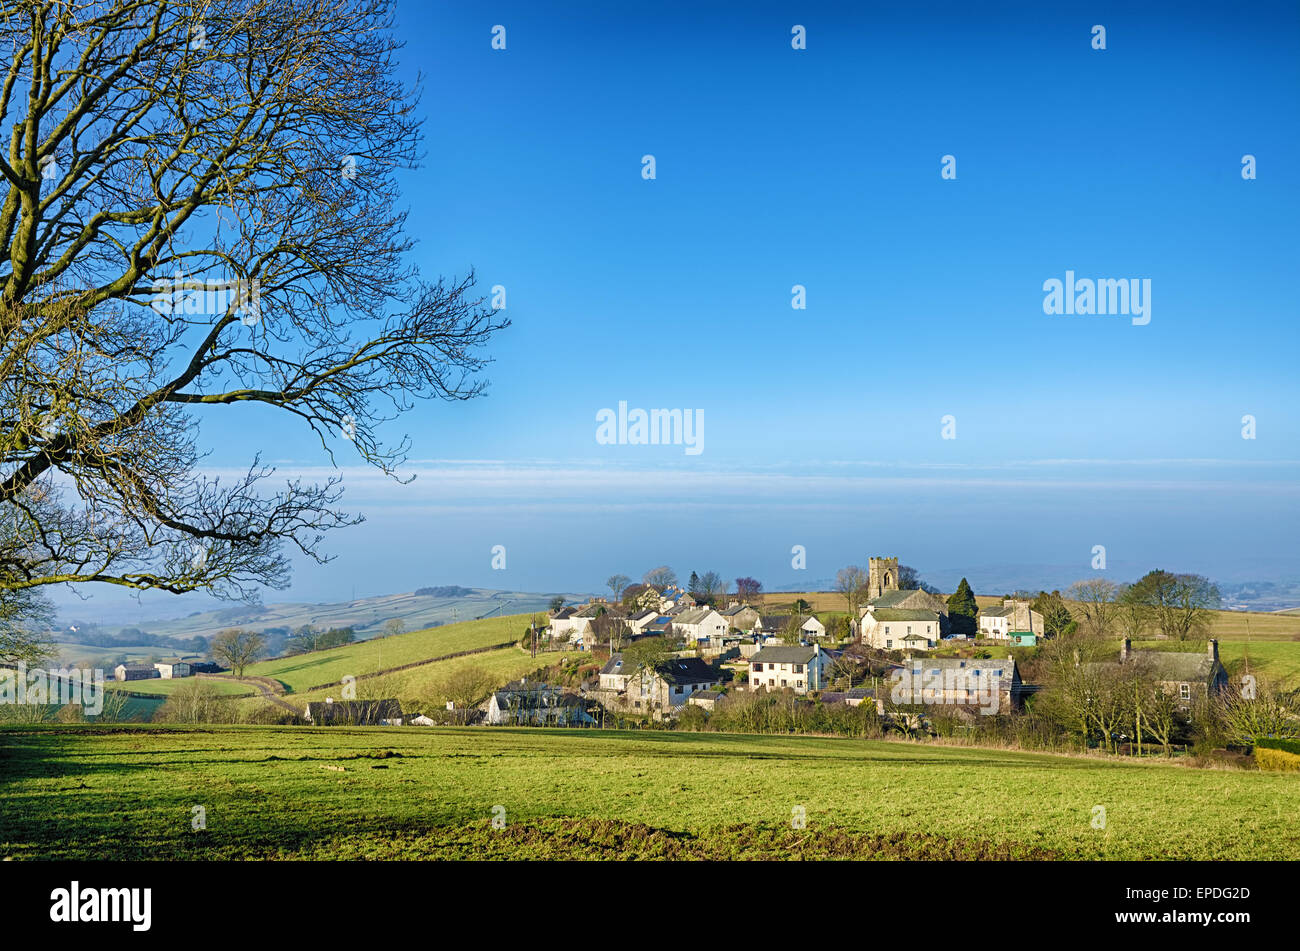 Grayrigg village in Cumbria - Stock Image